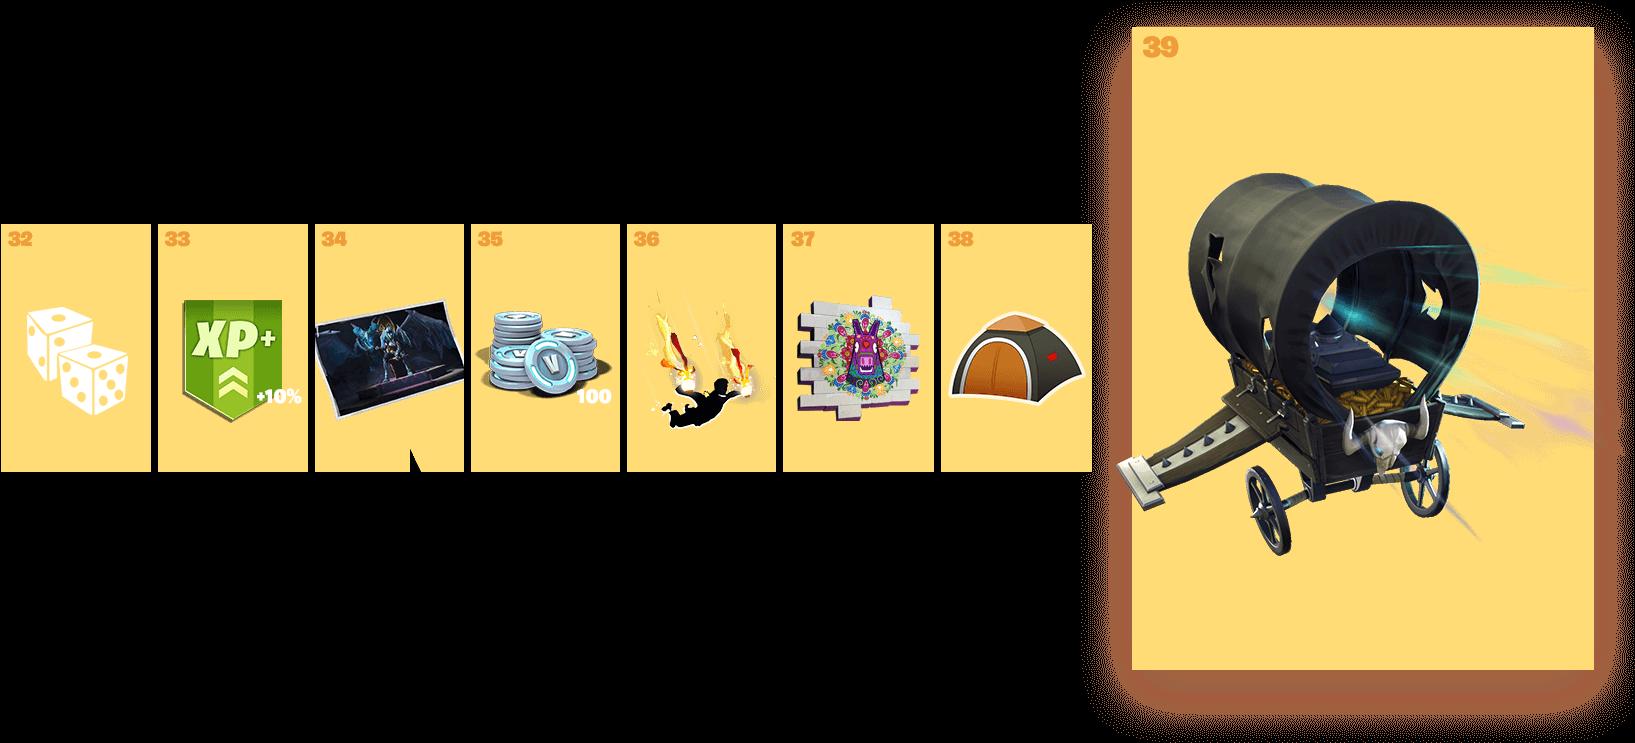 Download Gun Game Pass Roblox Png Gun Game Pass Roblox Fortnite